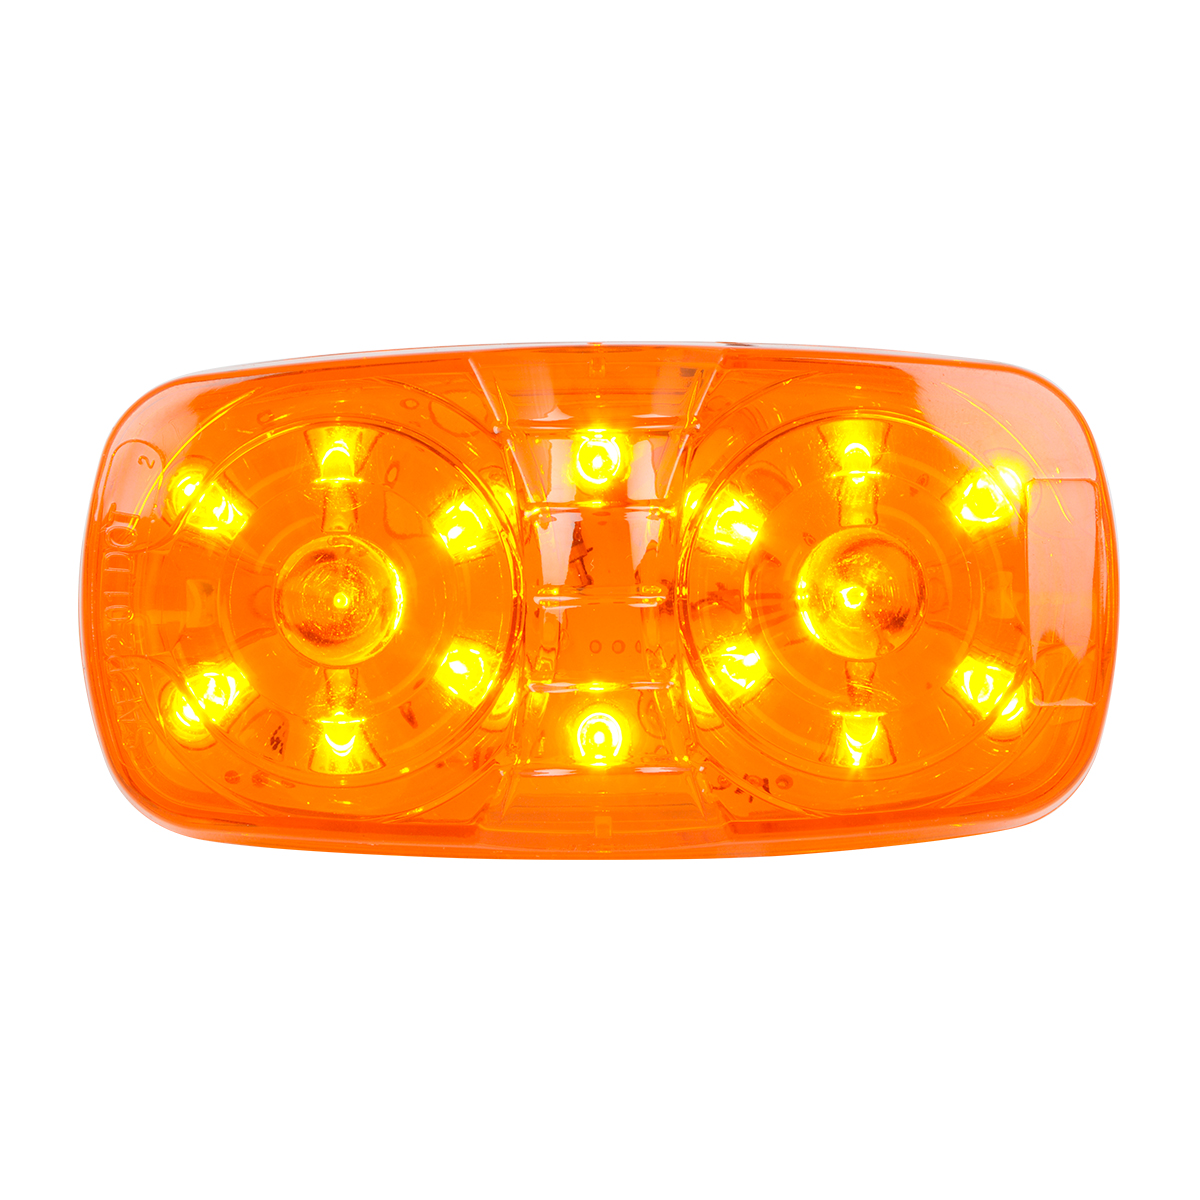 85240 Tiger Eye LED Marker Light in Amber/Amber